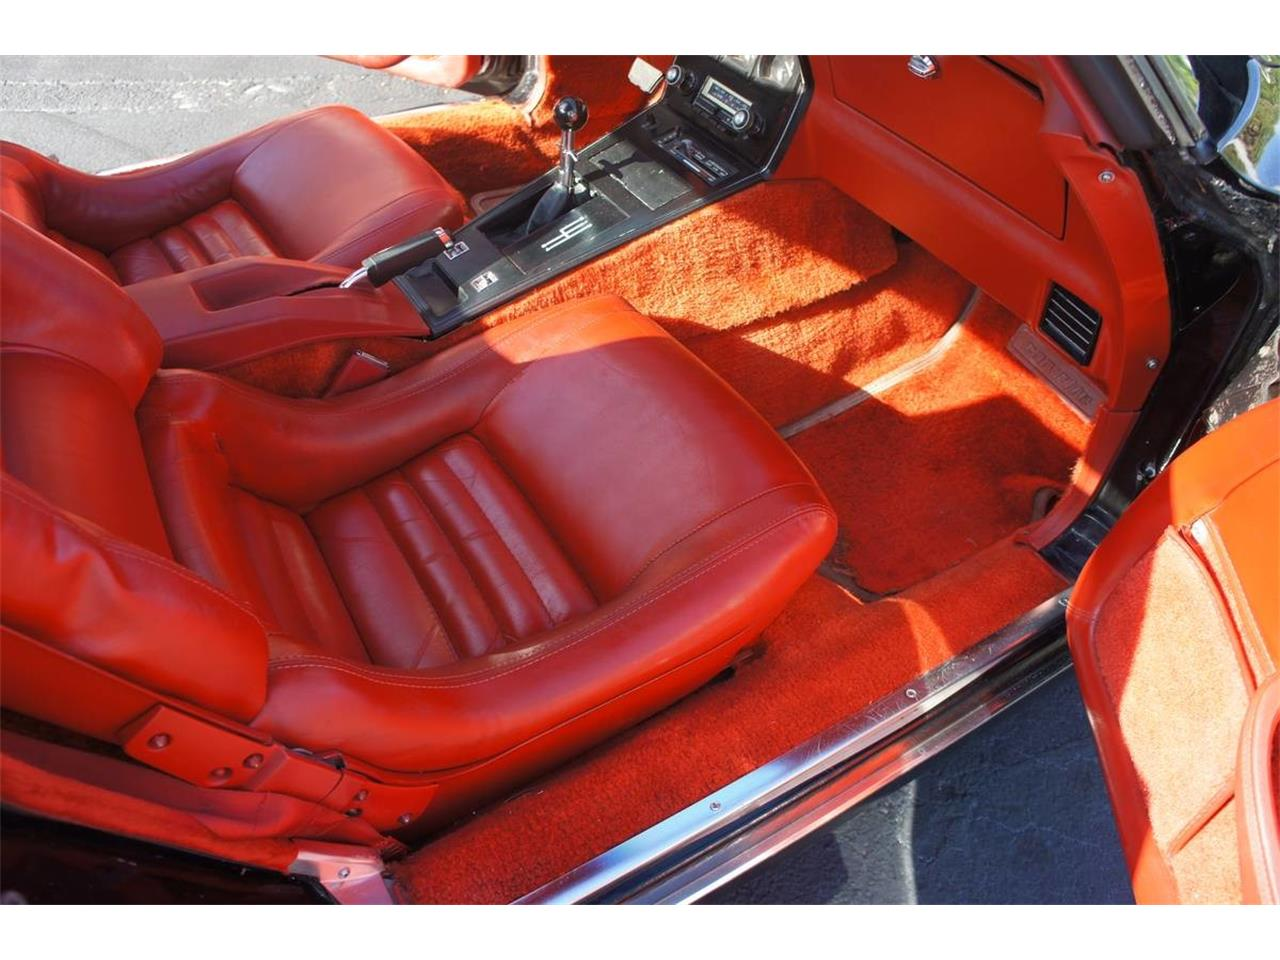 1979 Chevrolet Corvette (CC-1360290) for sale in Lantana, Florida